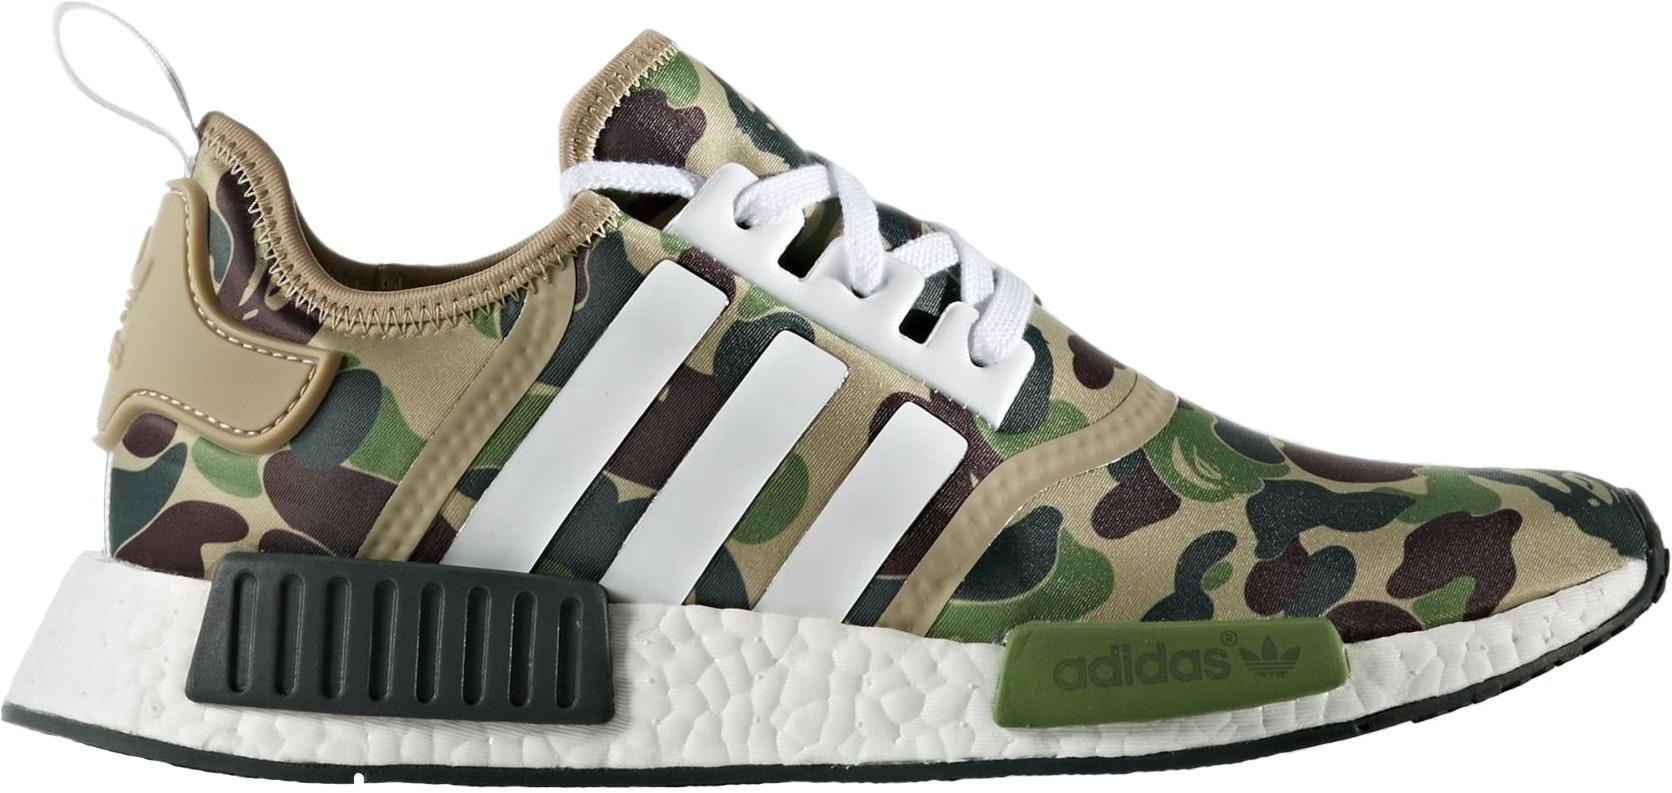 "adidas NMD R1 Primeknit ""Zebra Pack Releases Info Custom Dad"